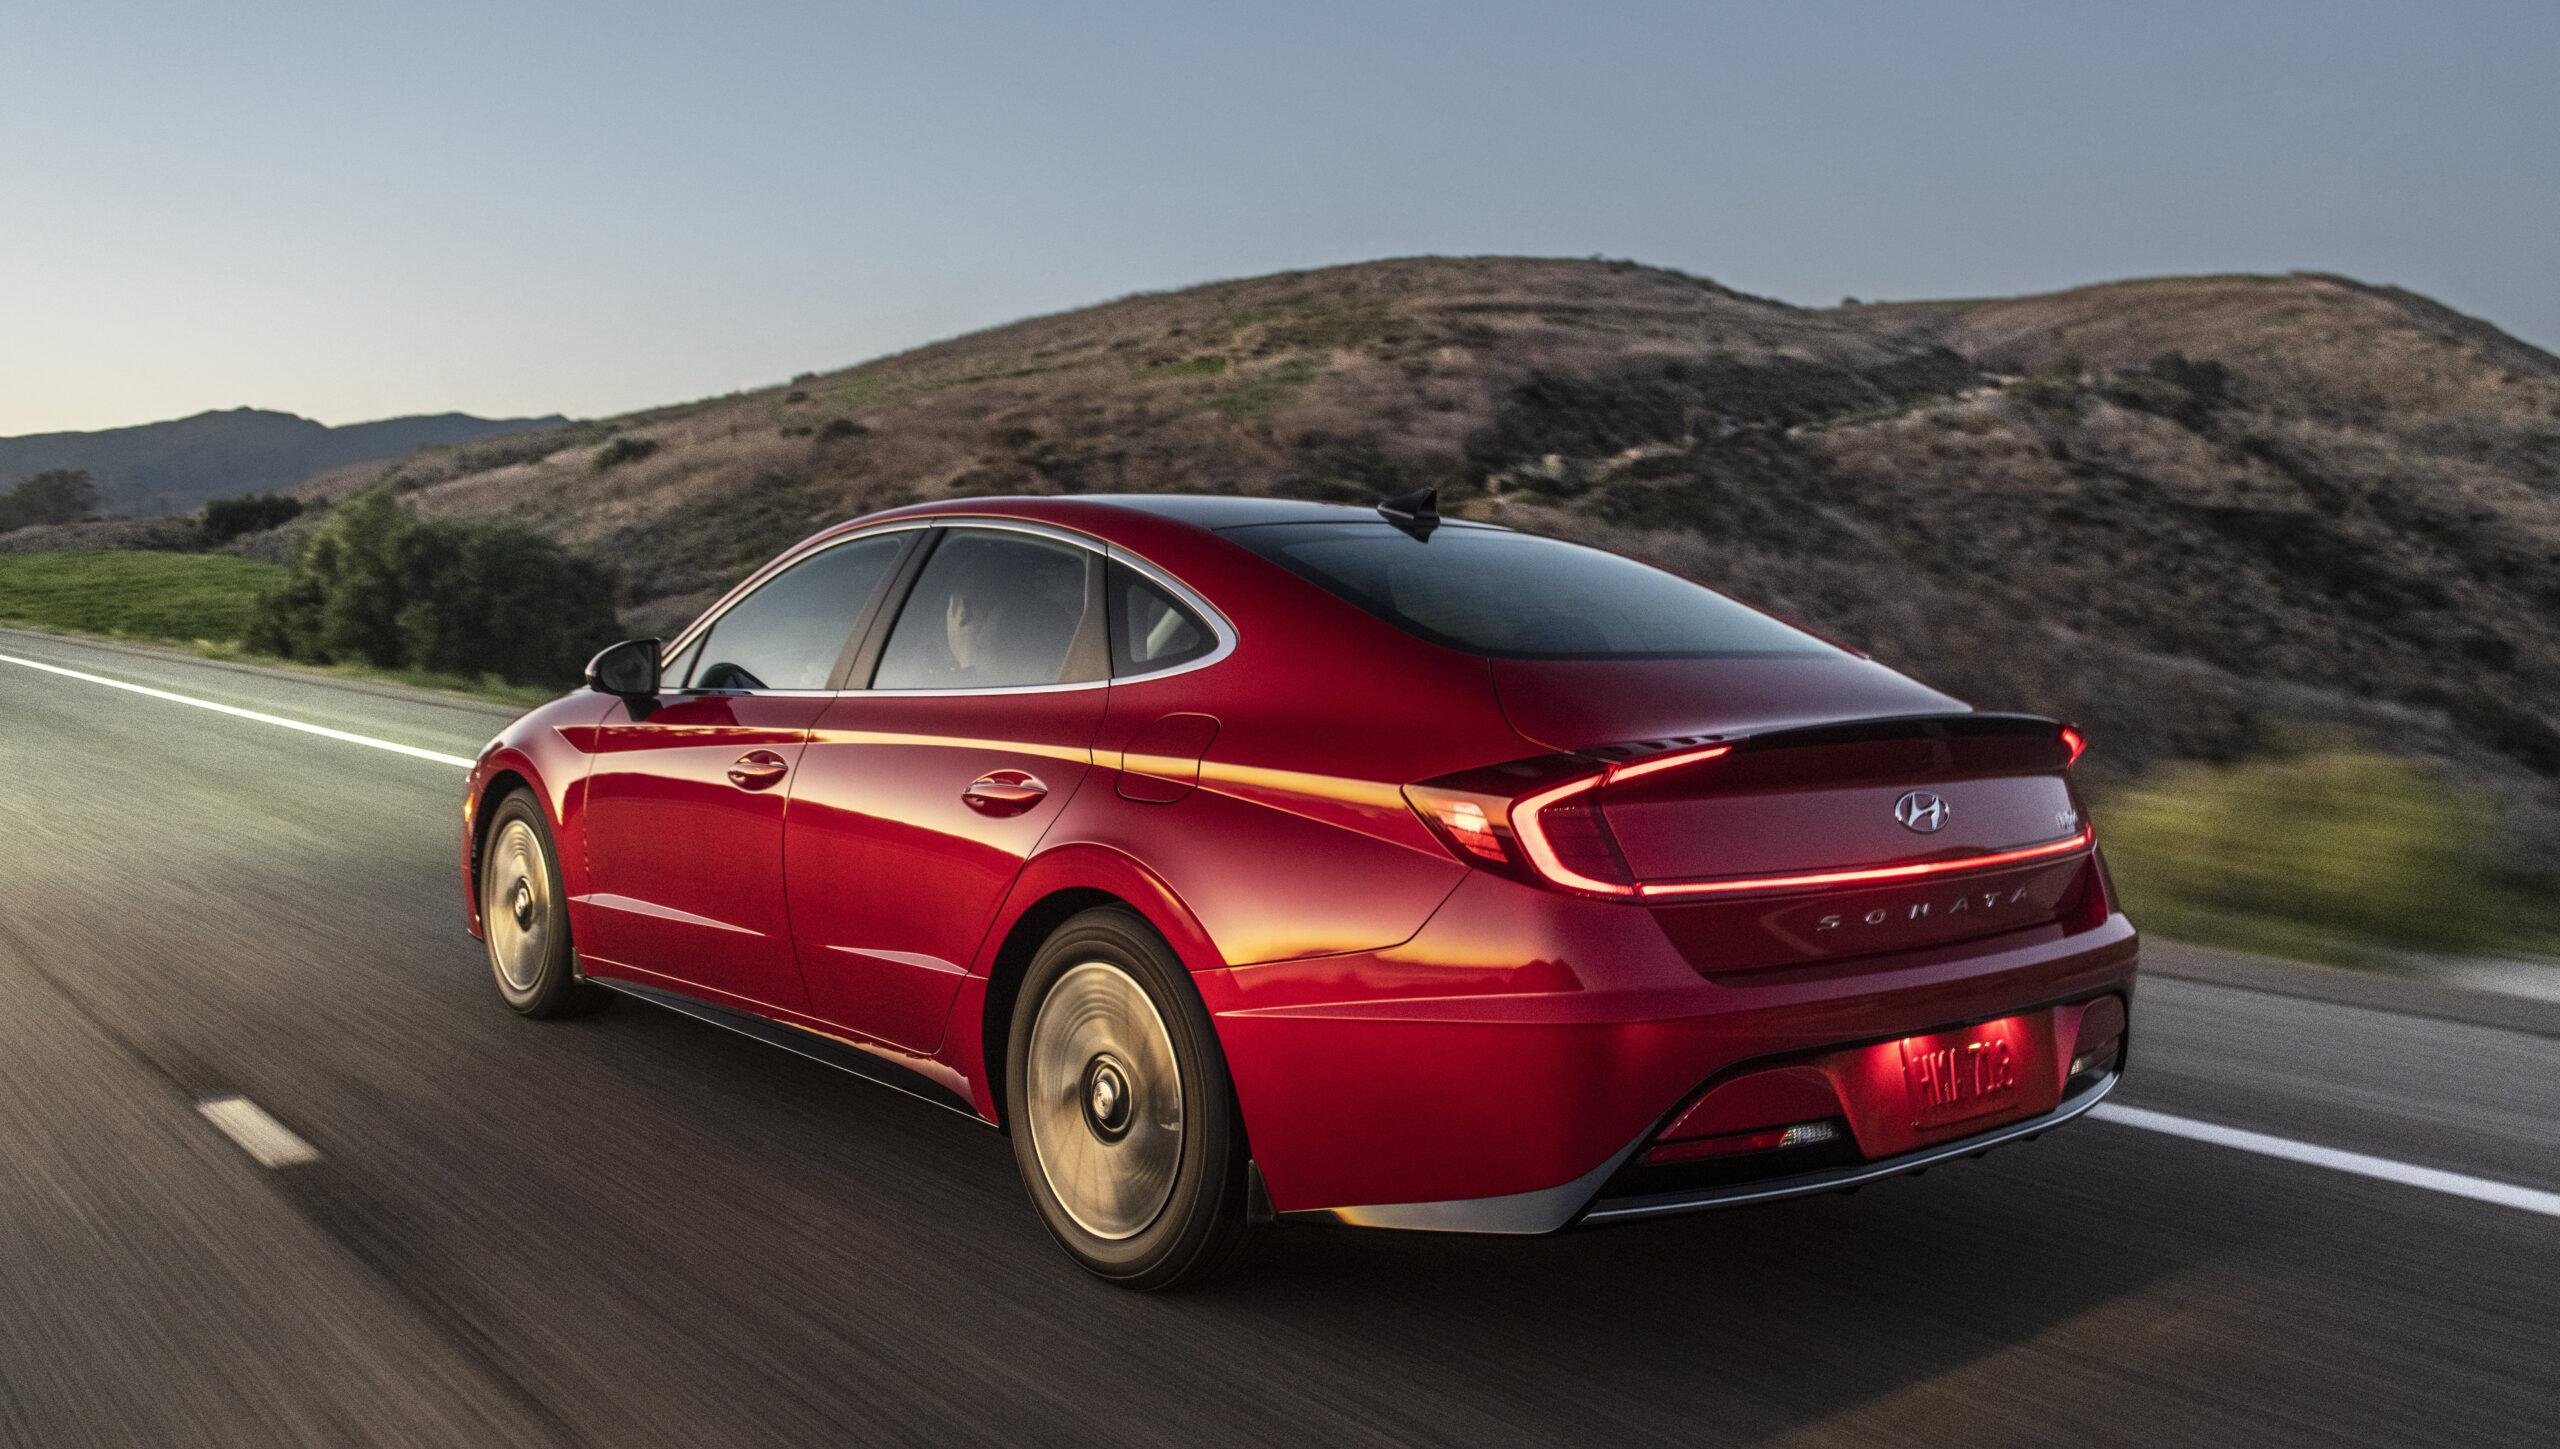 2020 Hyundai Sonata Hybrid pricing